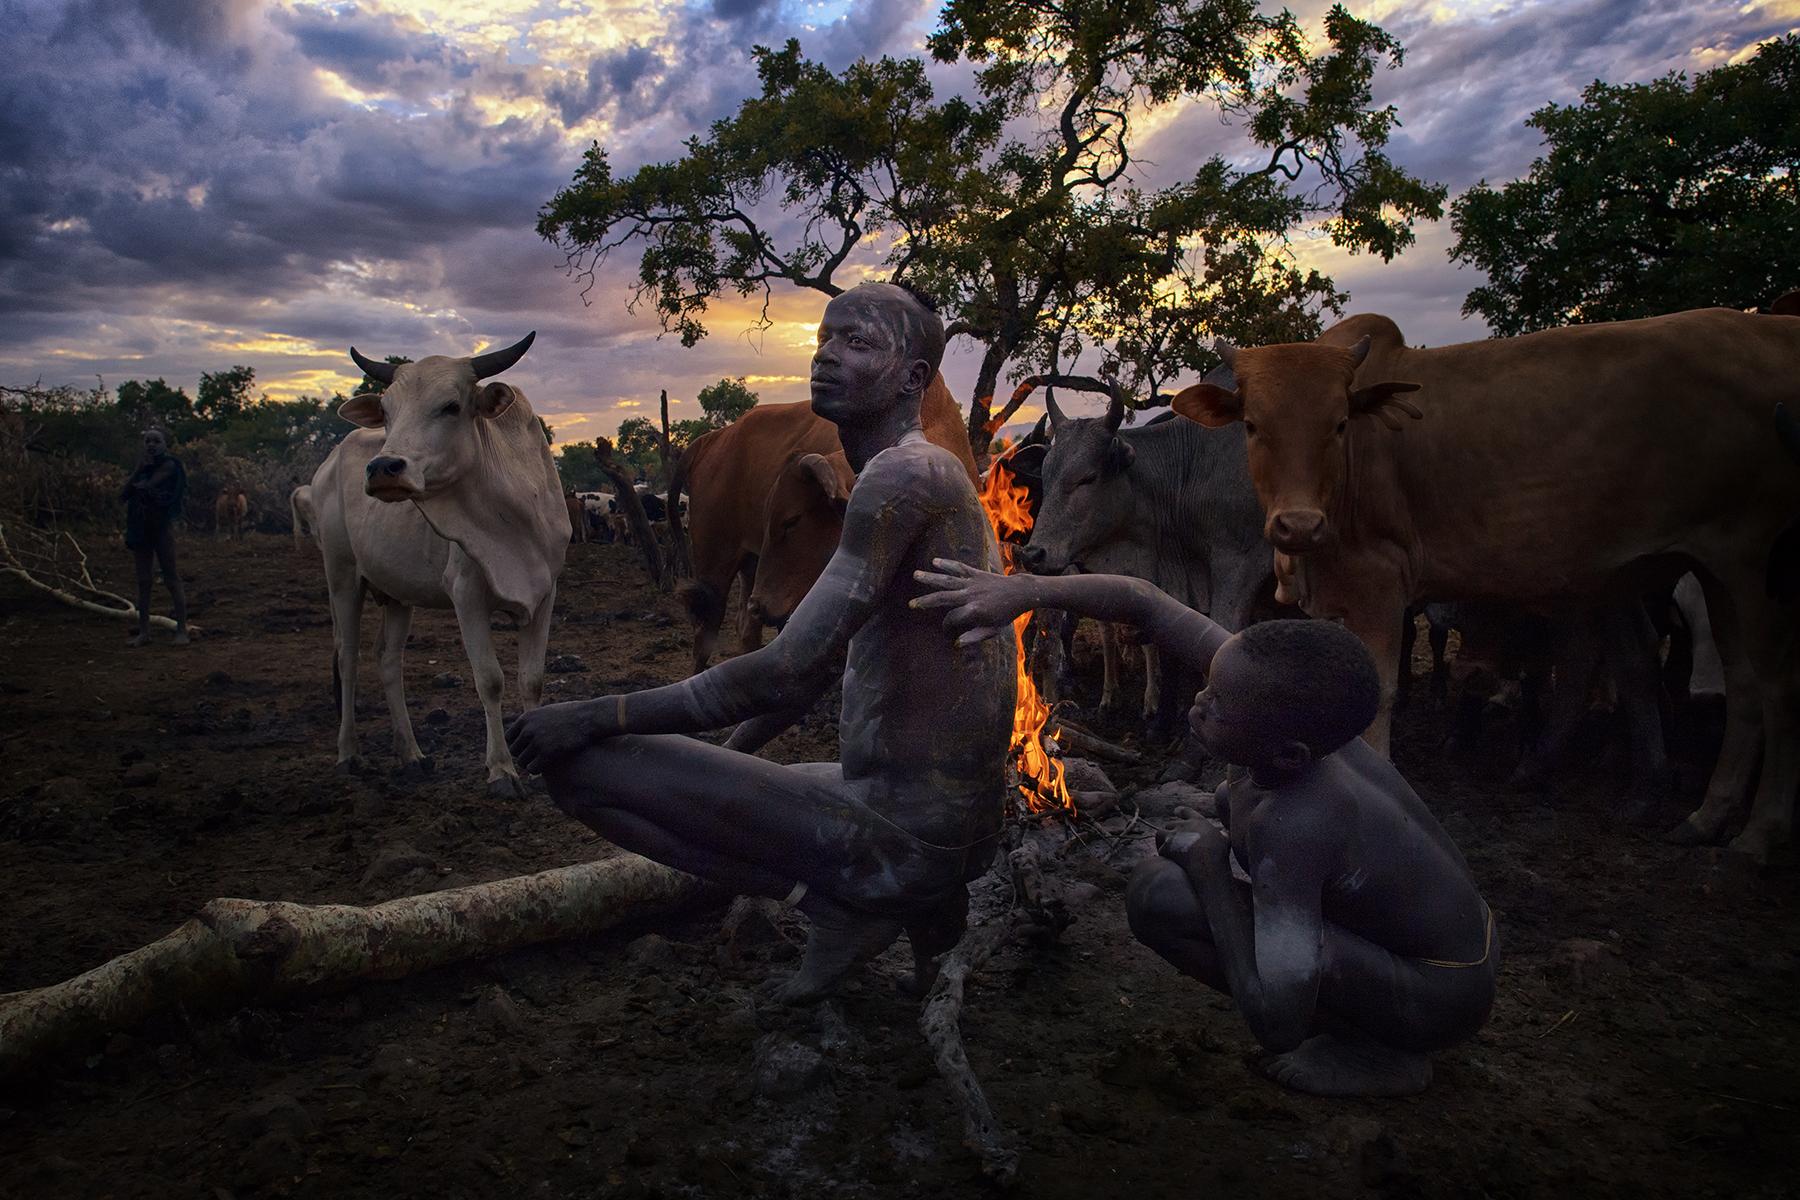 David Nam Lip_LEE_The Ritual Belong To The Suri Tribe Of Ethiopia_Body Painting_1.jpg